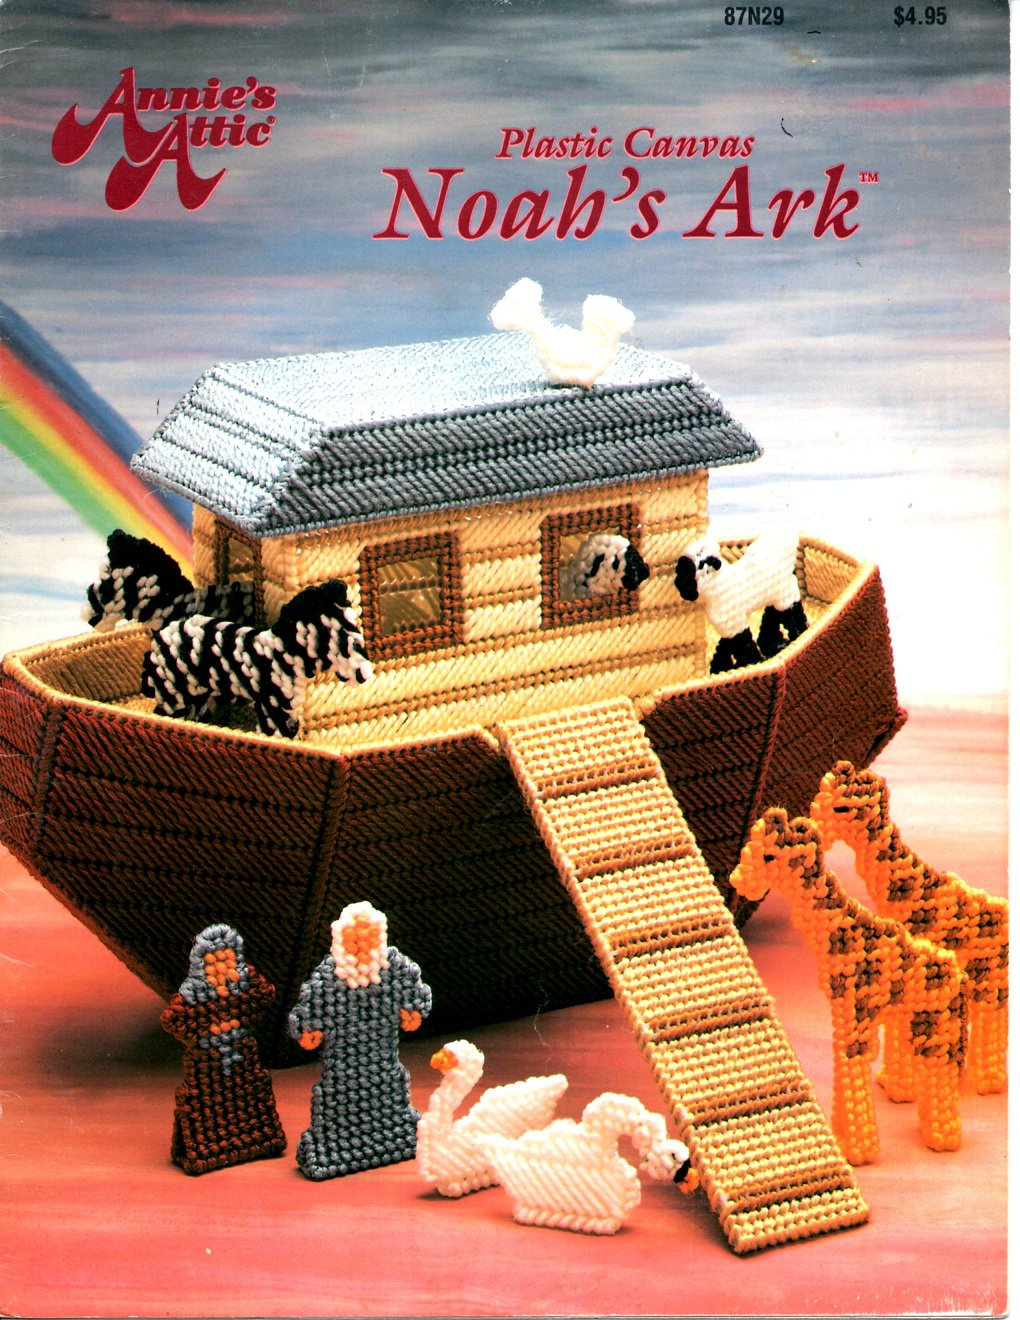 plastic canvas noah s ark pattern book   annies attic 87n29